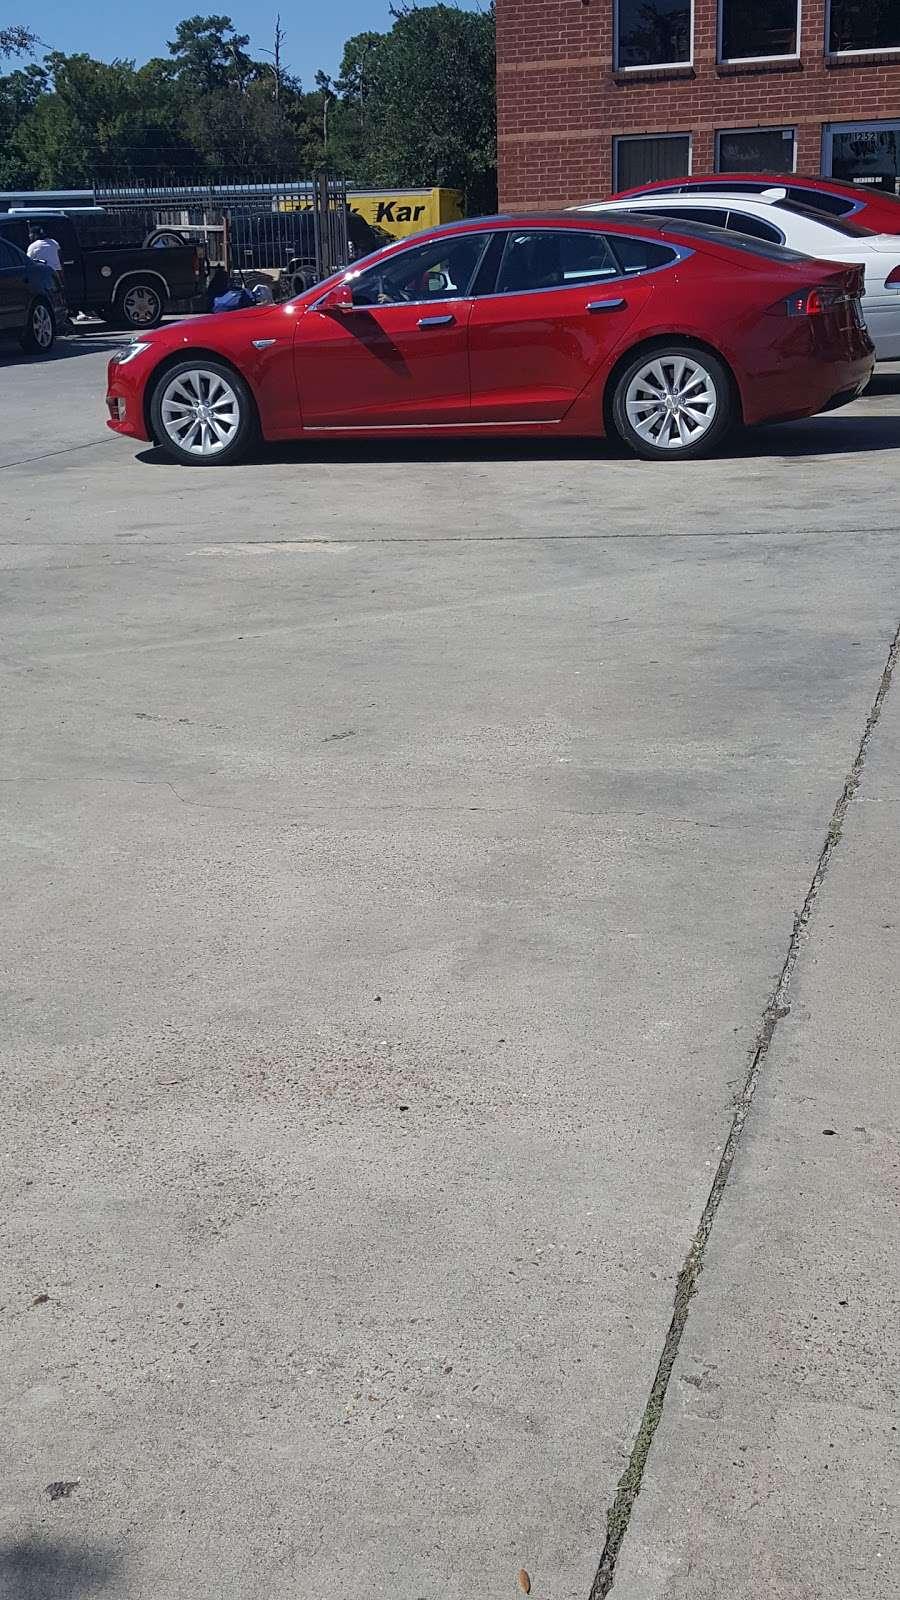 Kwik Kar Lube & Tune - car repair    Photo 10 of 10   Address: 12521 Kuykendahl Rd, Houston, TX 77090, USA   Phone: (281) 872-8884